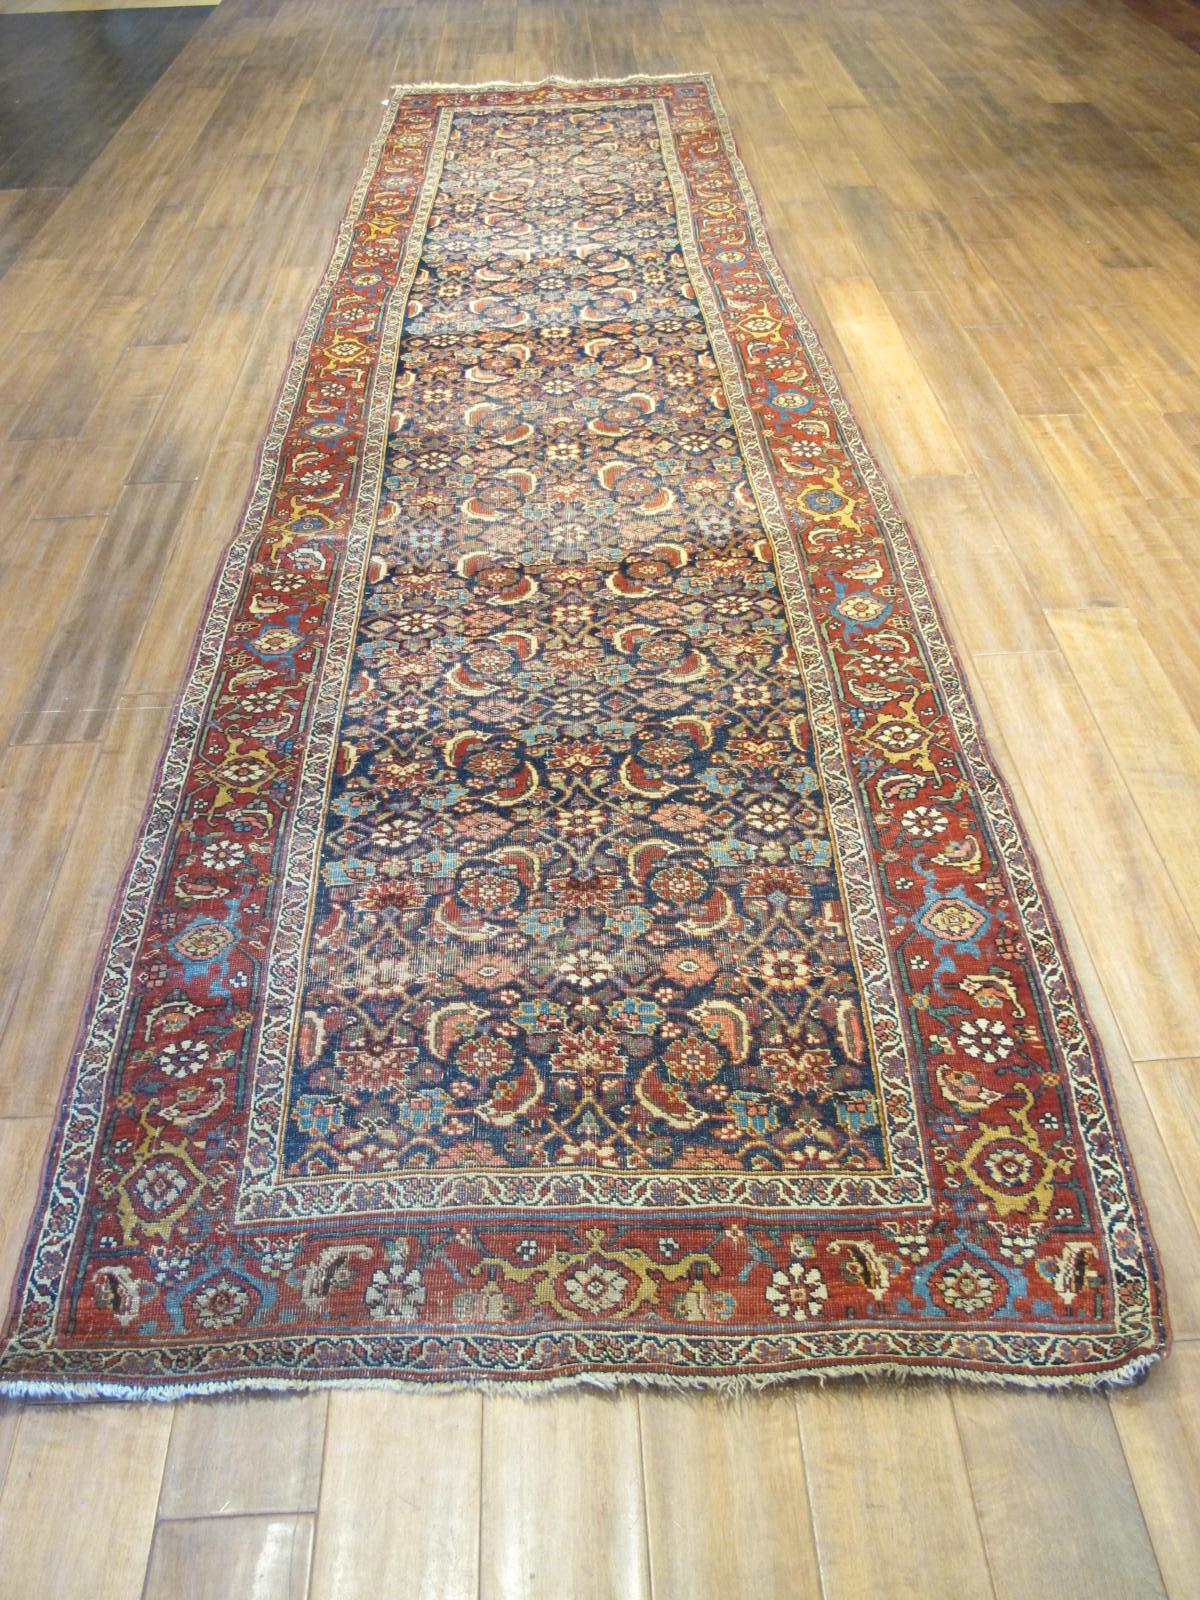 13078 antique persian bidjar runner 3,6x13,4 (2)